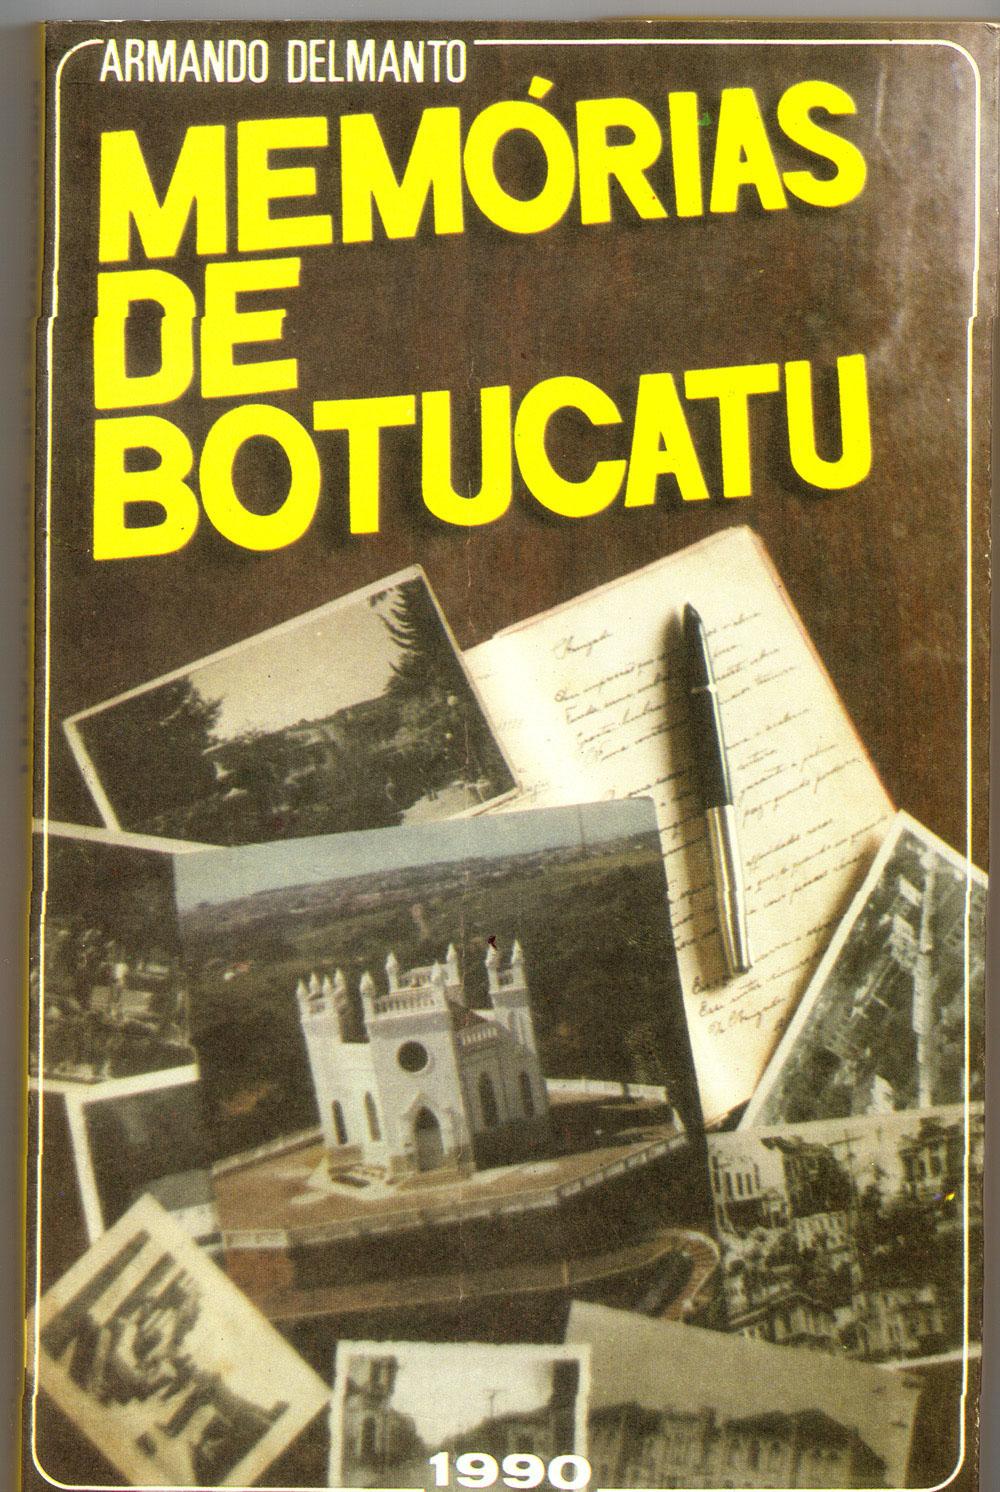 Memorias de Botucatu